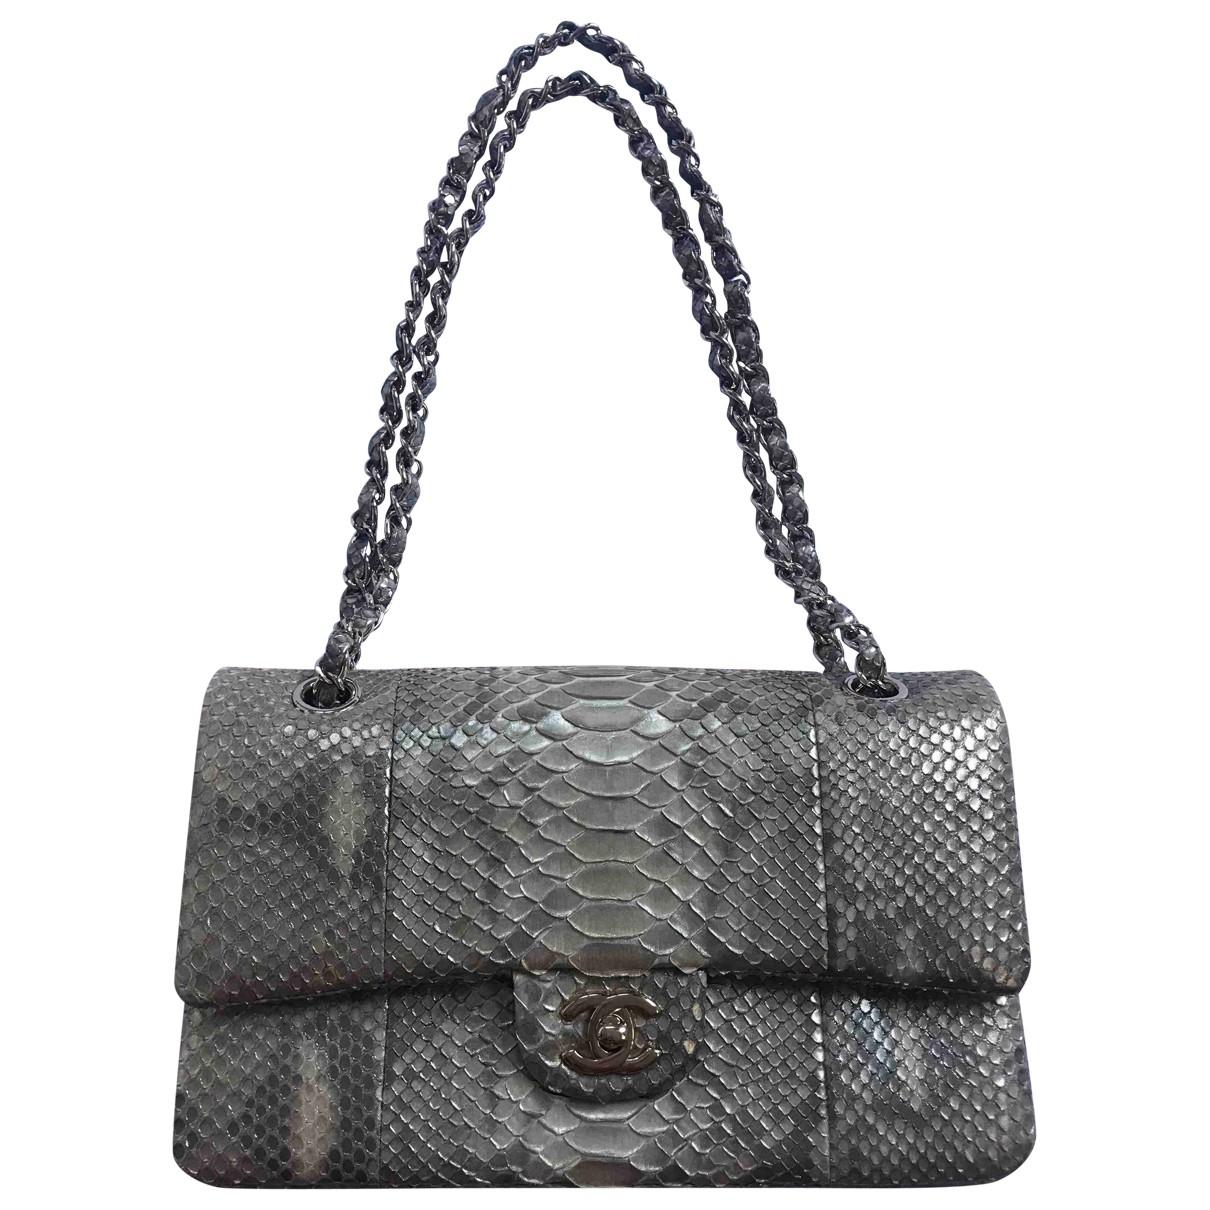 Chanel Timeless/Classique Handtasche in  Gold Python